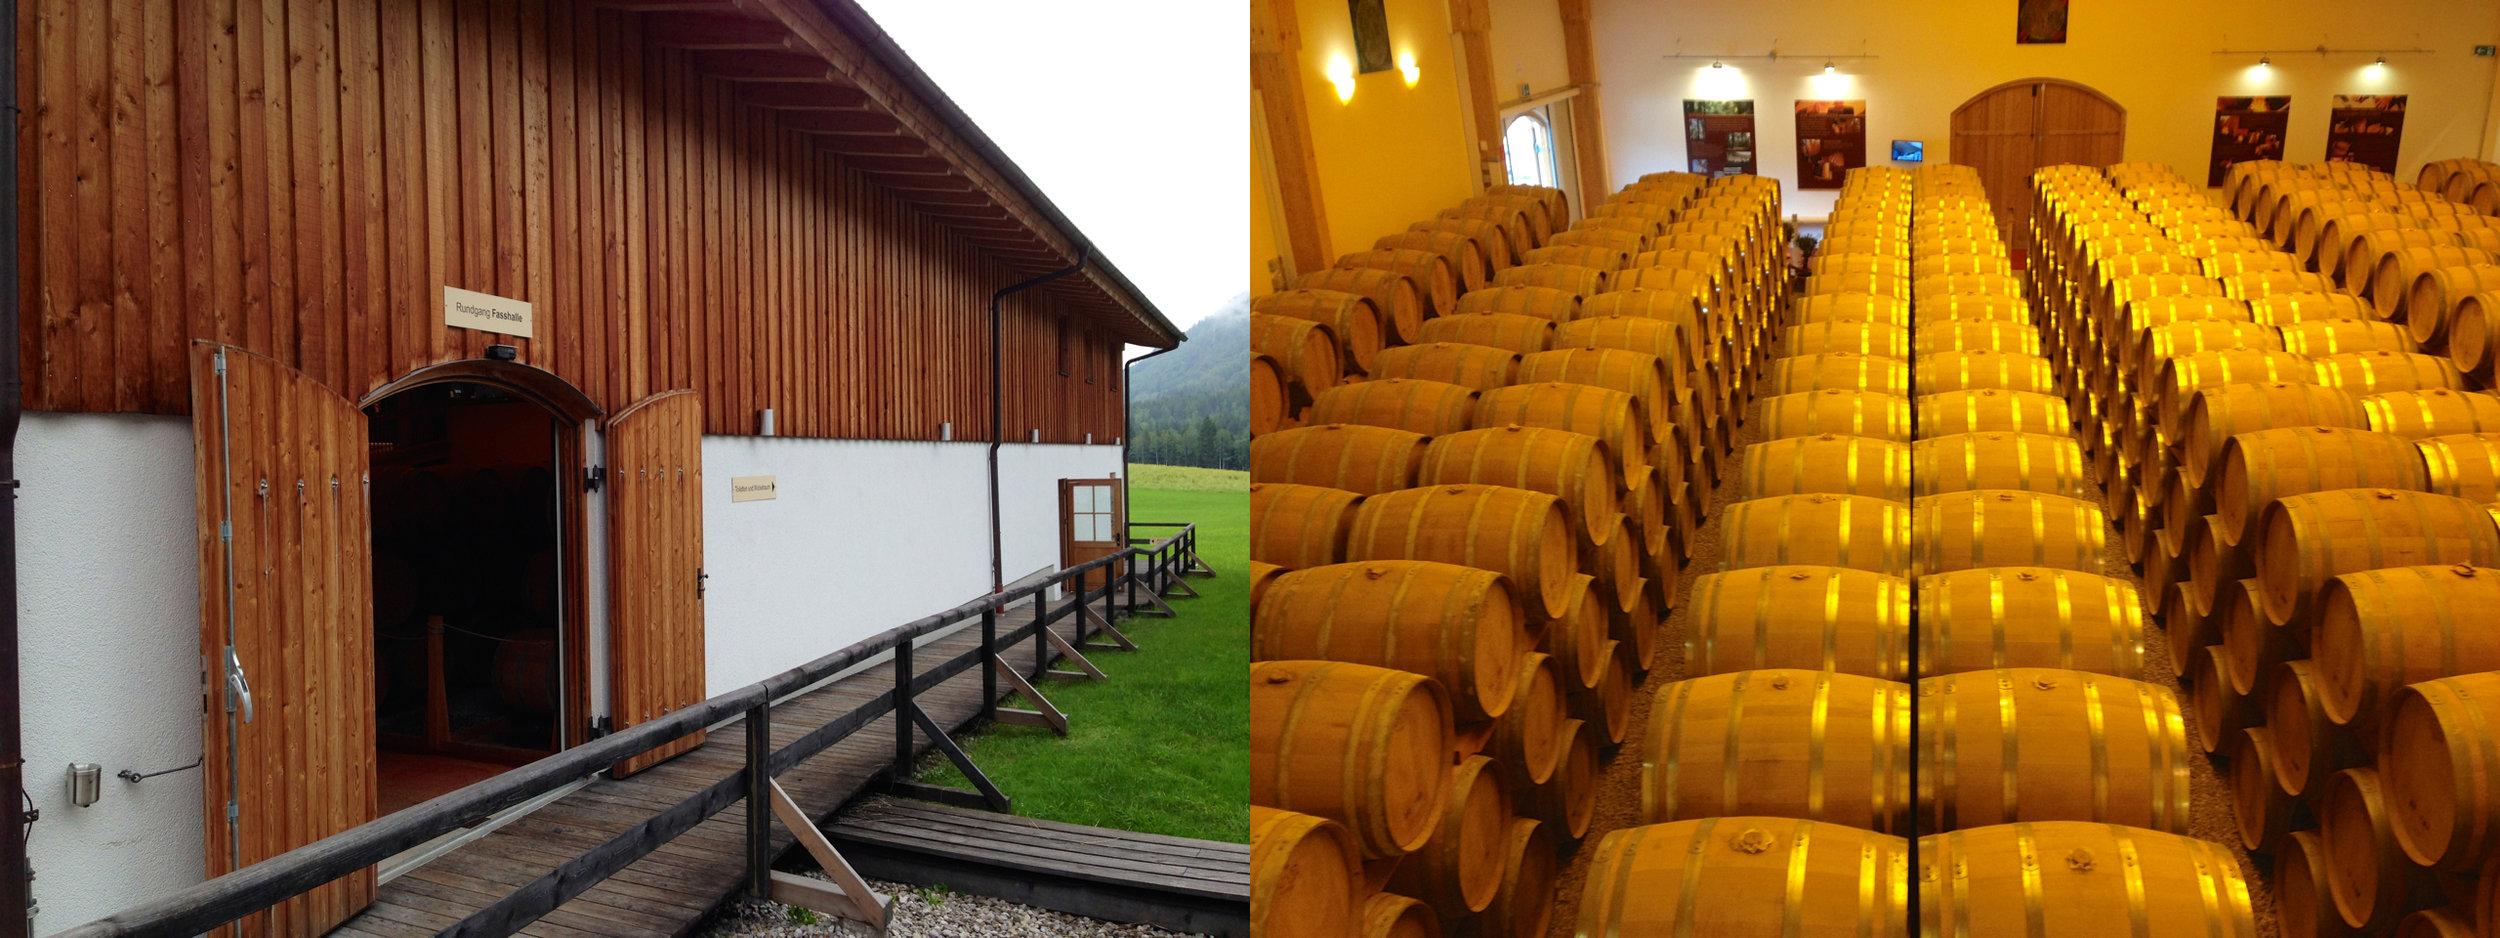 SLYRS - the Bavarian Distillery - warehouse